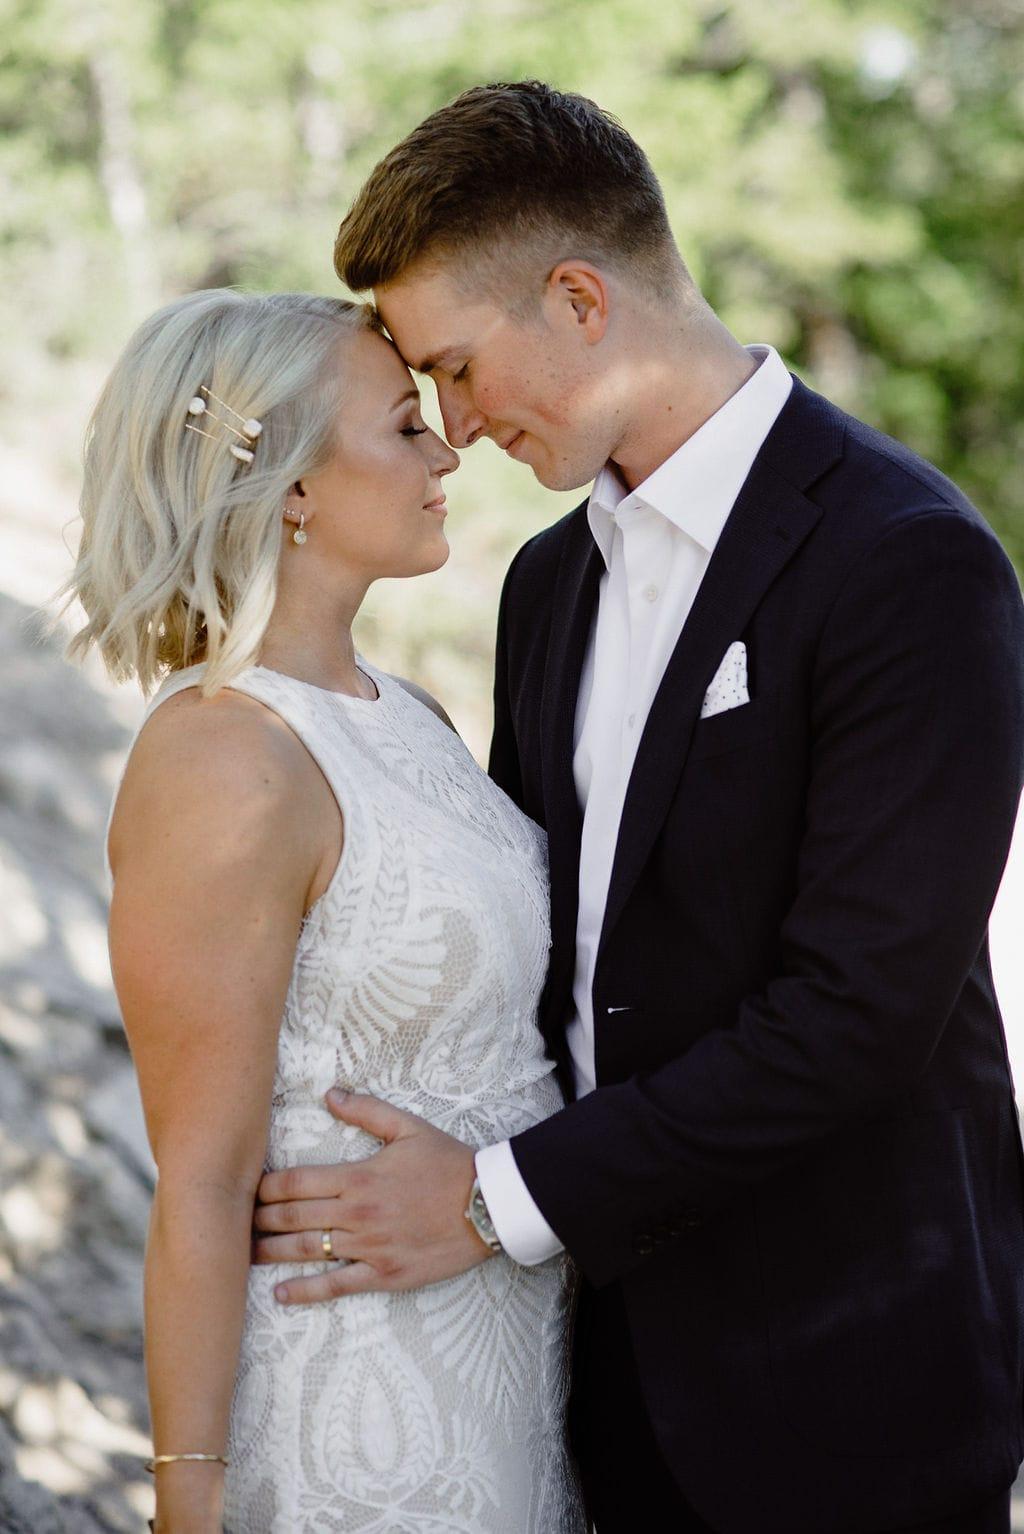 romantic wedding portrait of bride and groom